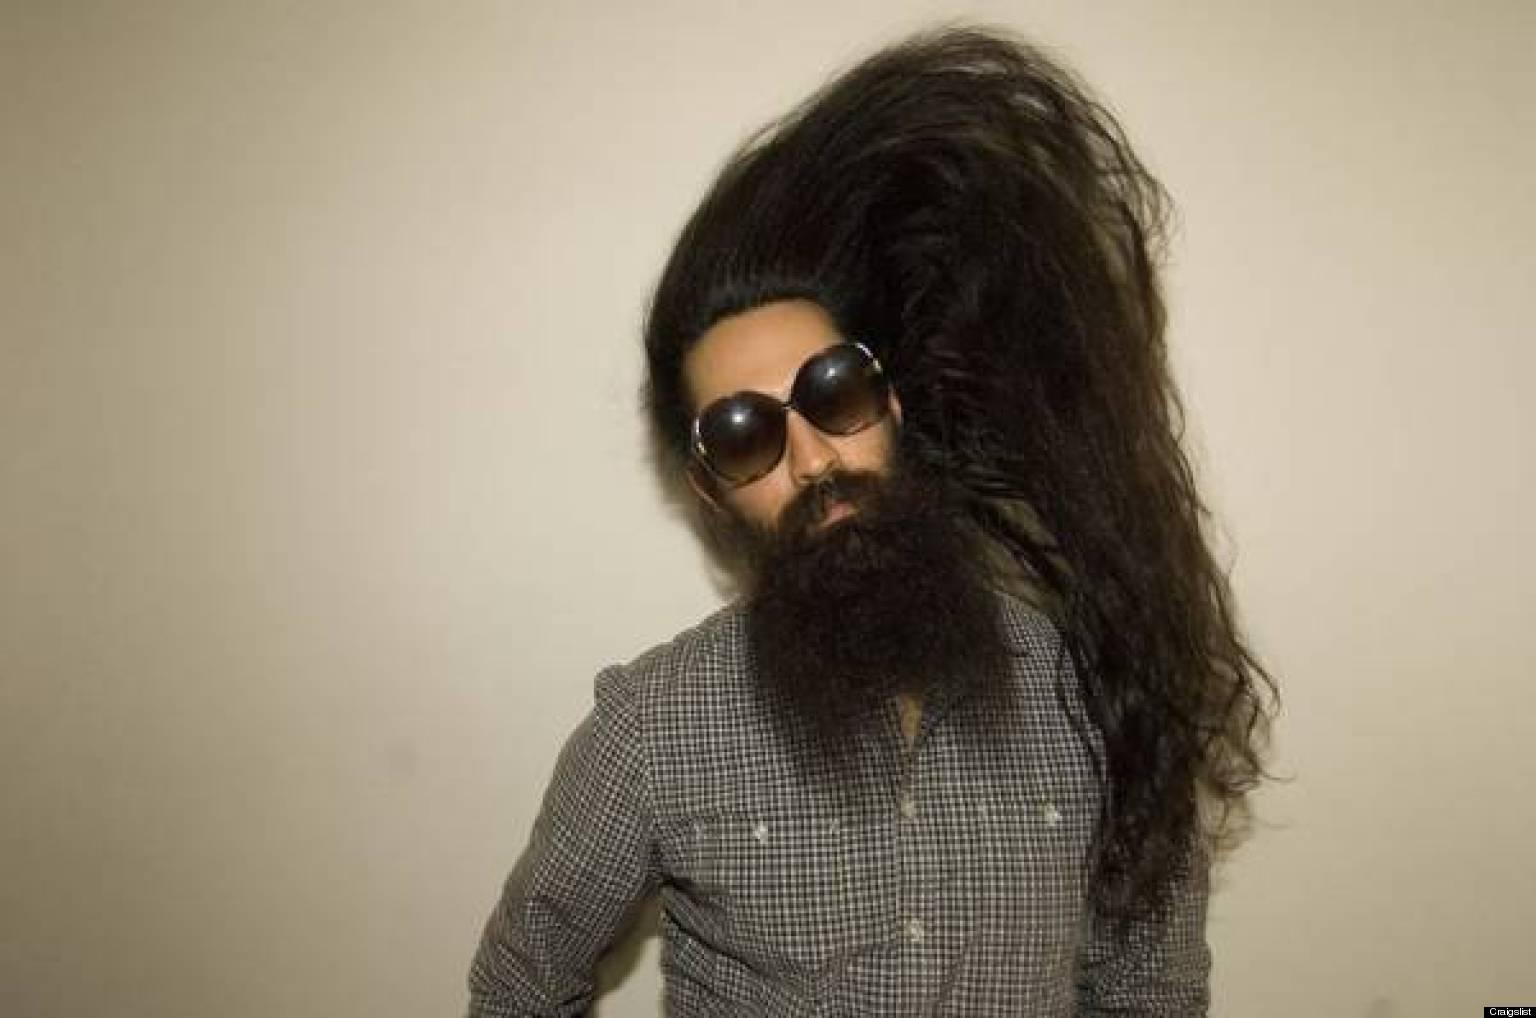 'Virgin Hair' For Sale On Craigslist: NYC Man Sells 27 ...